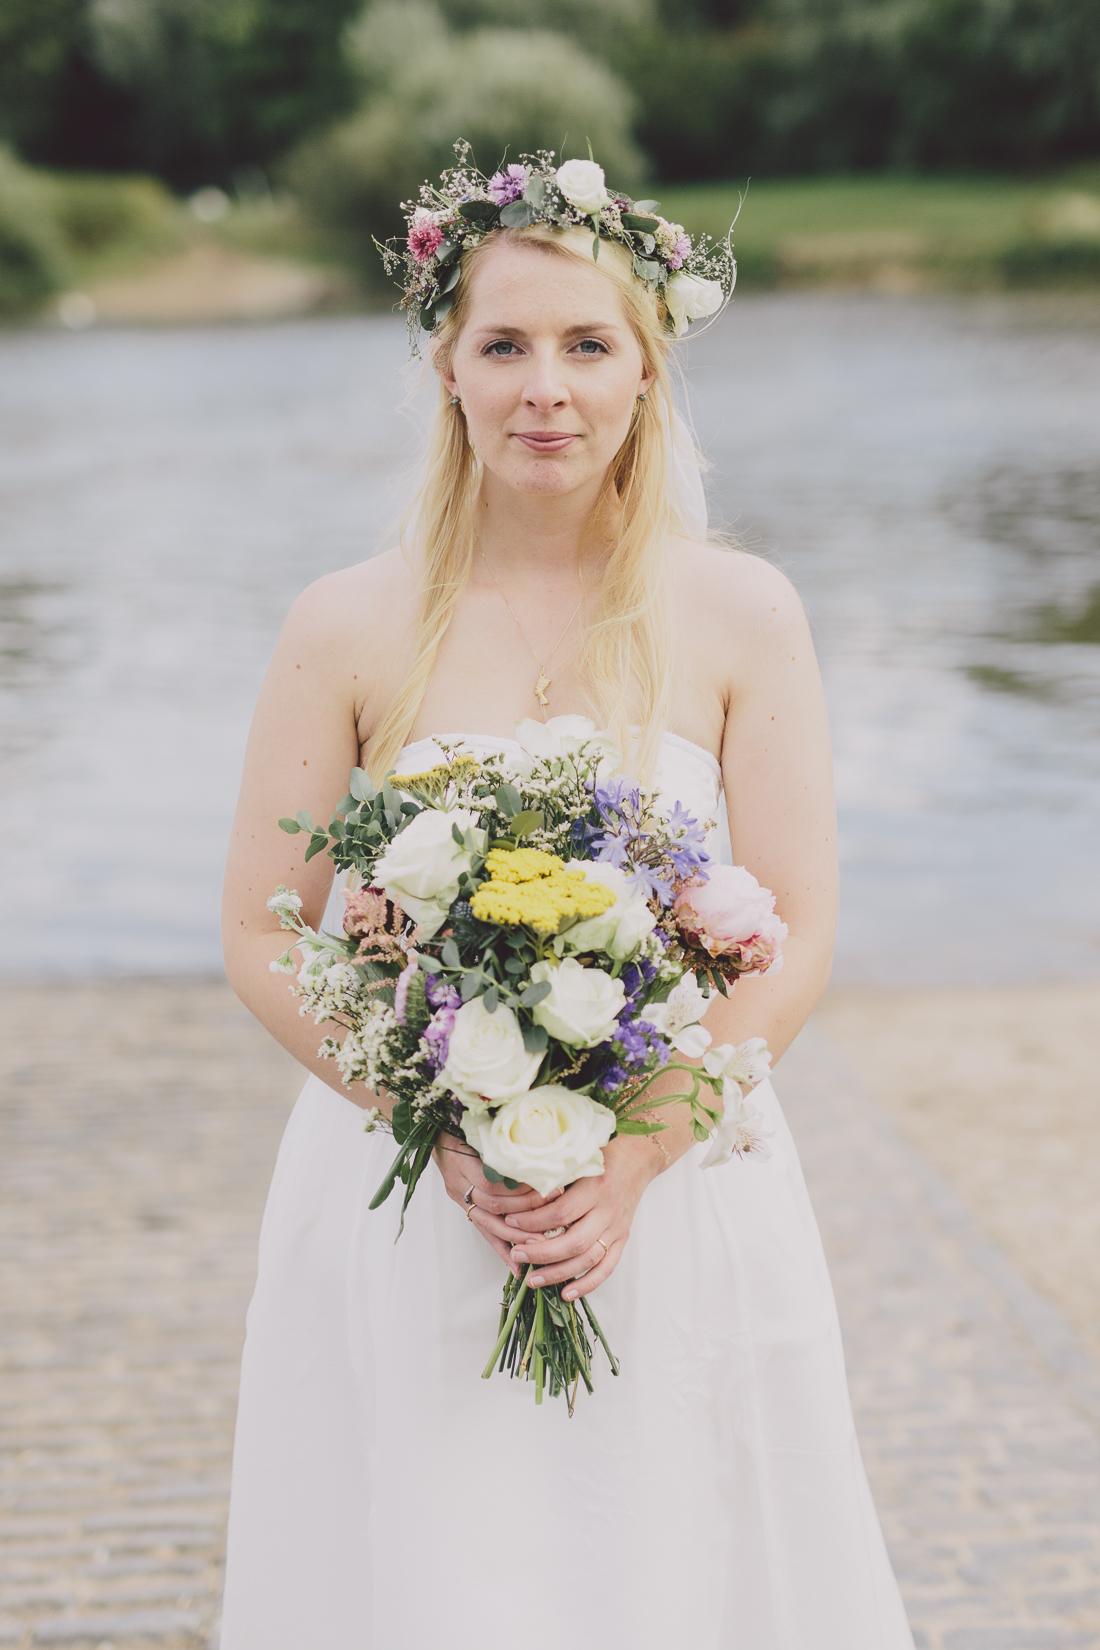 Flo + Ollie Tewkesbury Festival Wedding Scuffins Photography 084